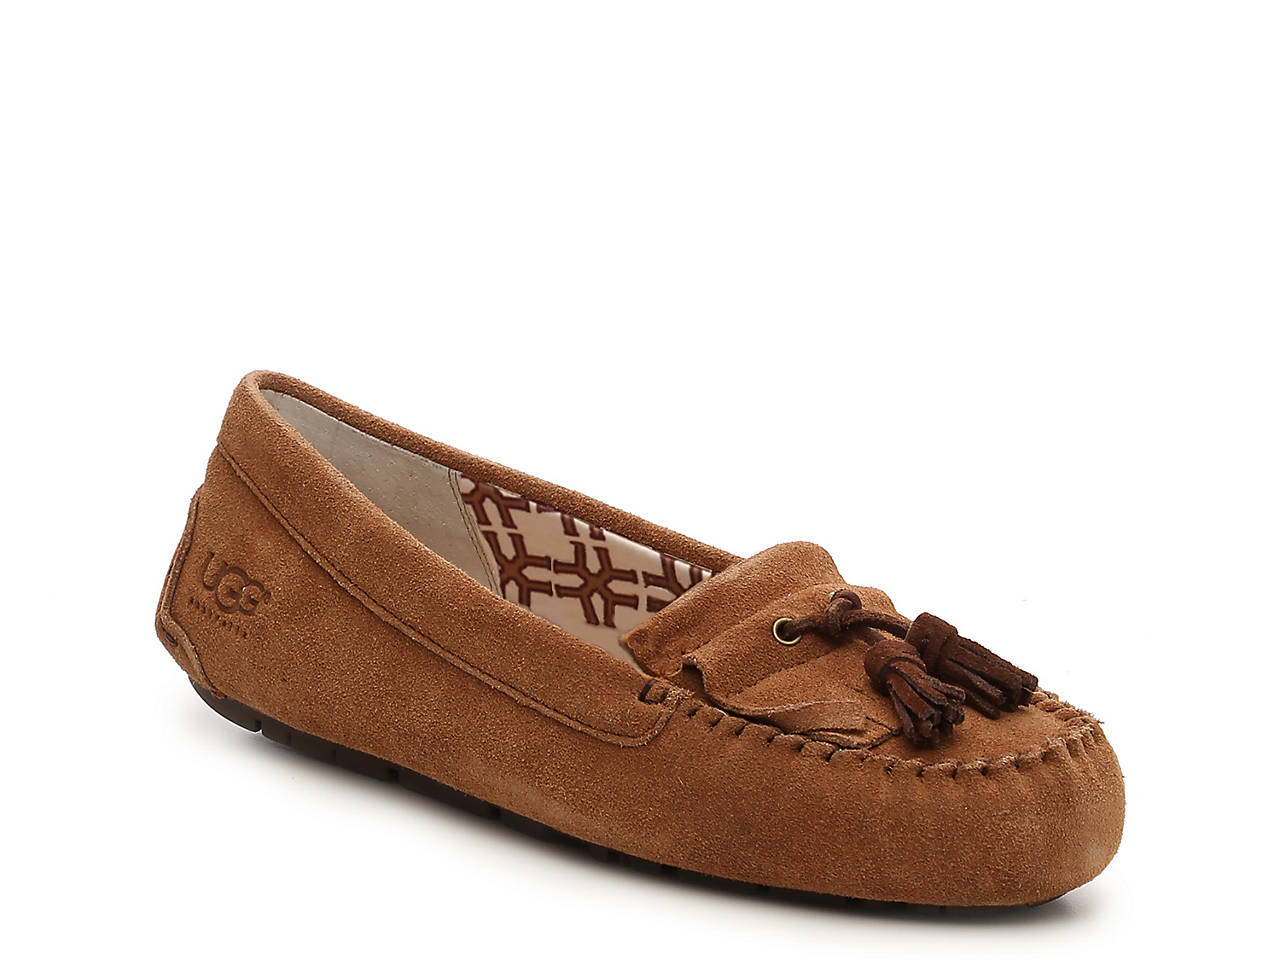 b2464ad976 UGG Australia Lizzy Slipper Women's Shoes | DSW